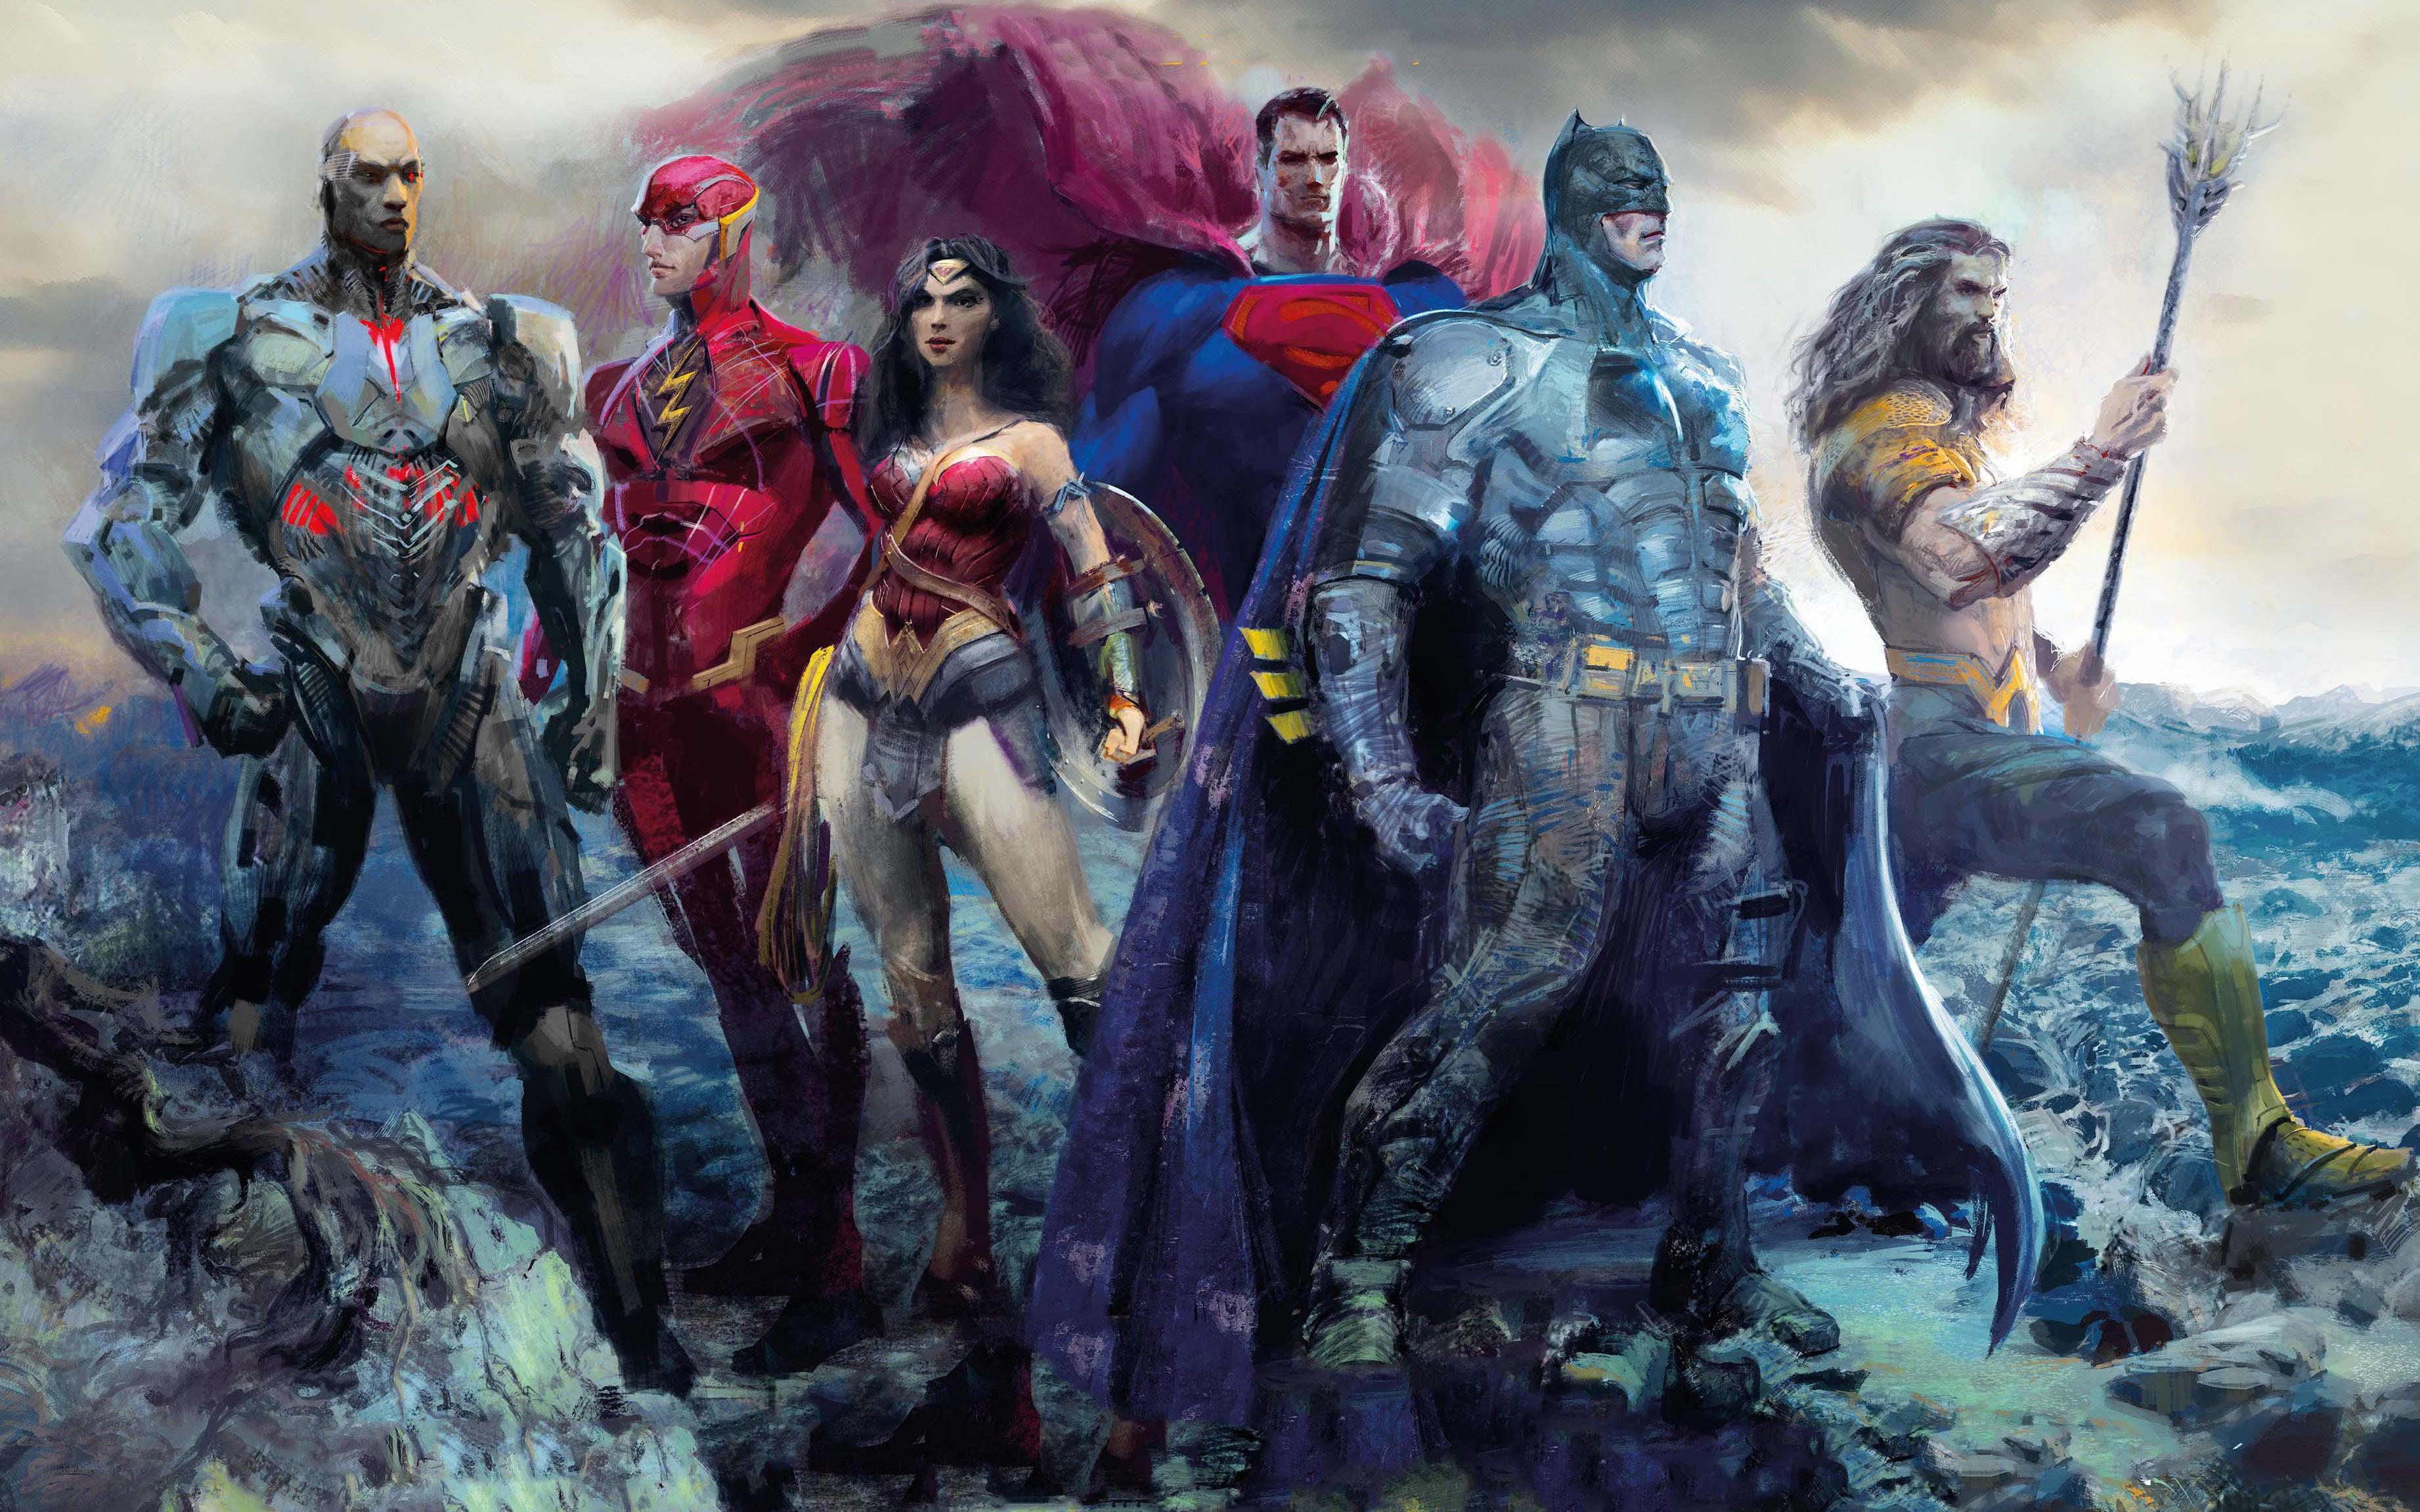 Wallpaper Justice League 2017 Movies Flash Superman: Justice League (2017) HD Wallpaper